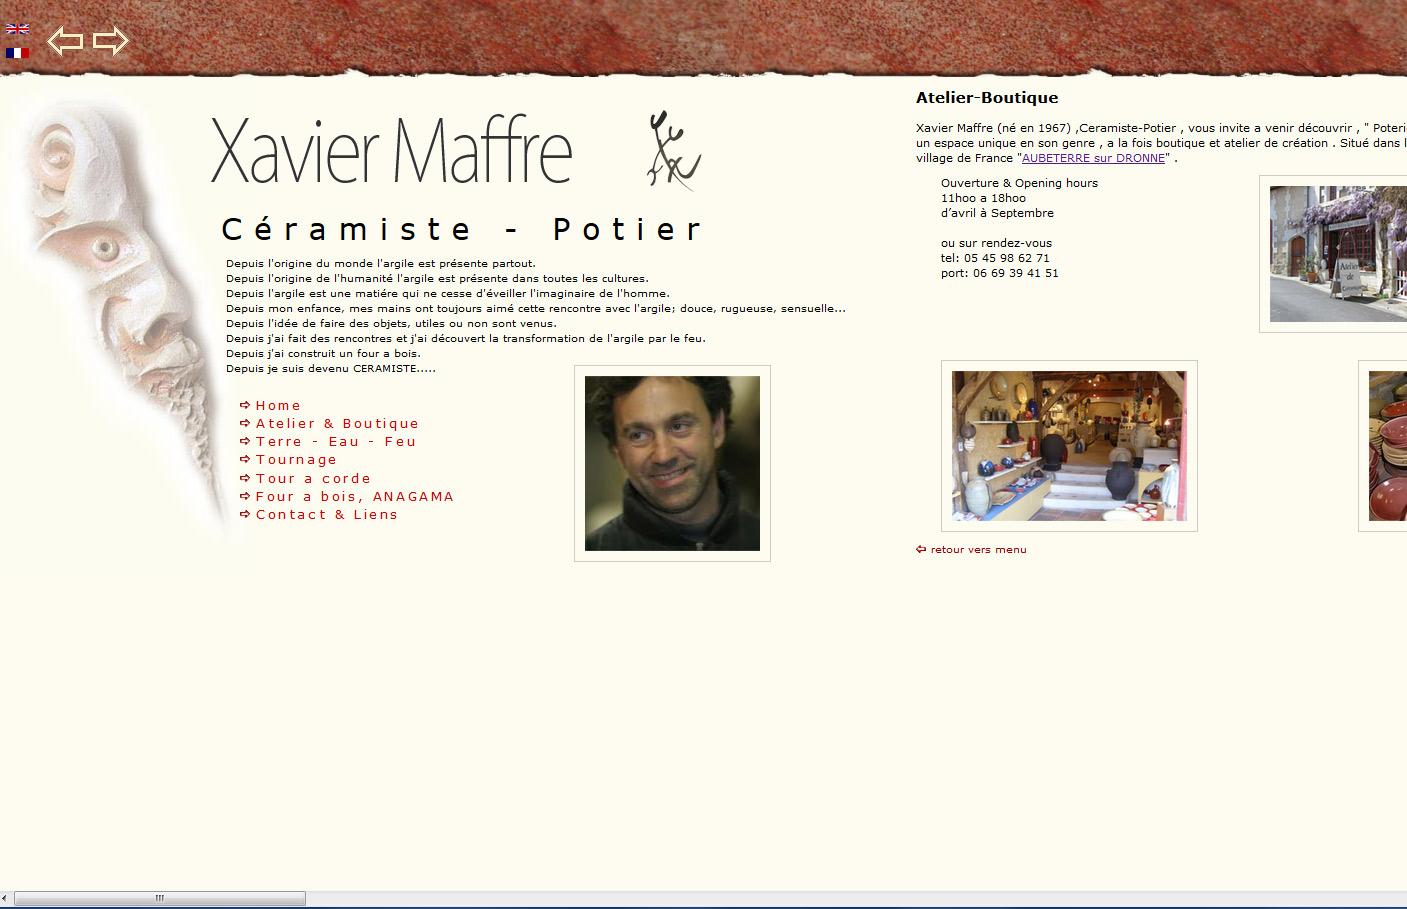 Xavier Maffre